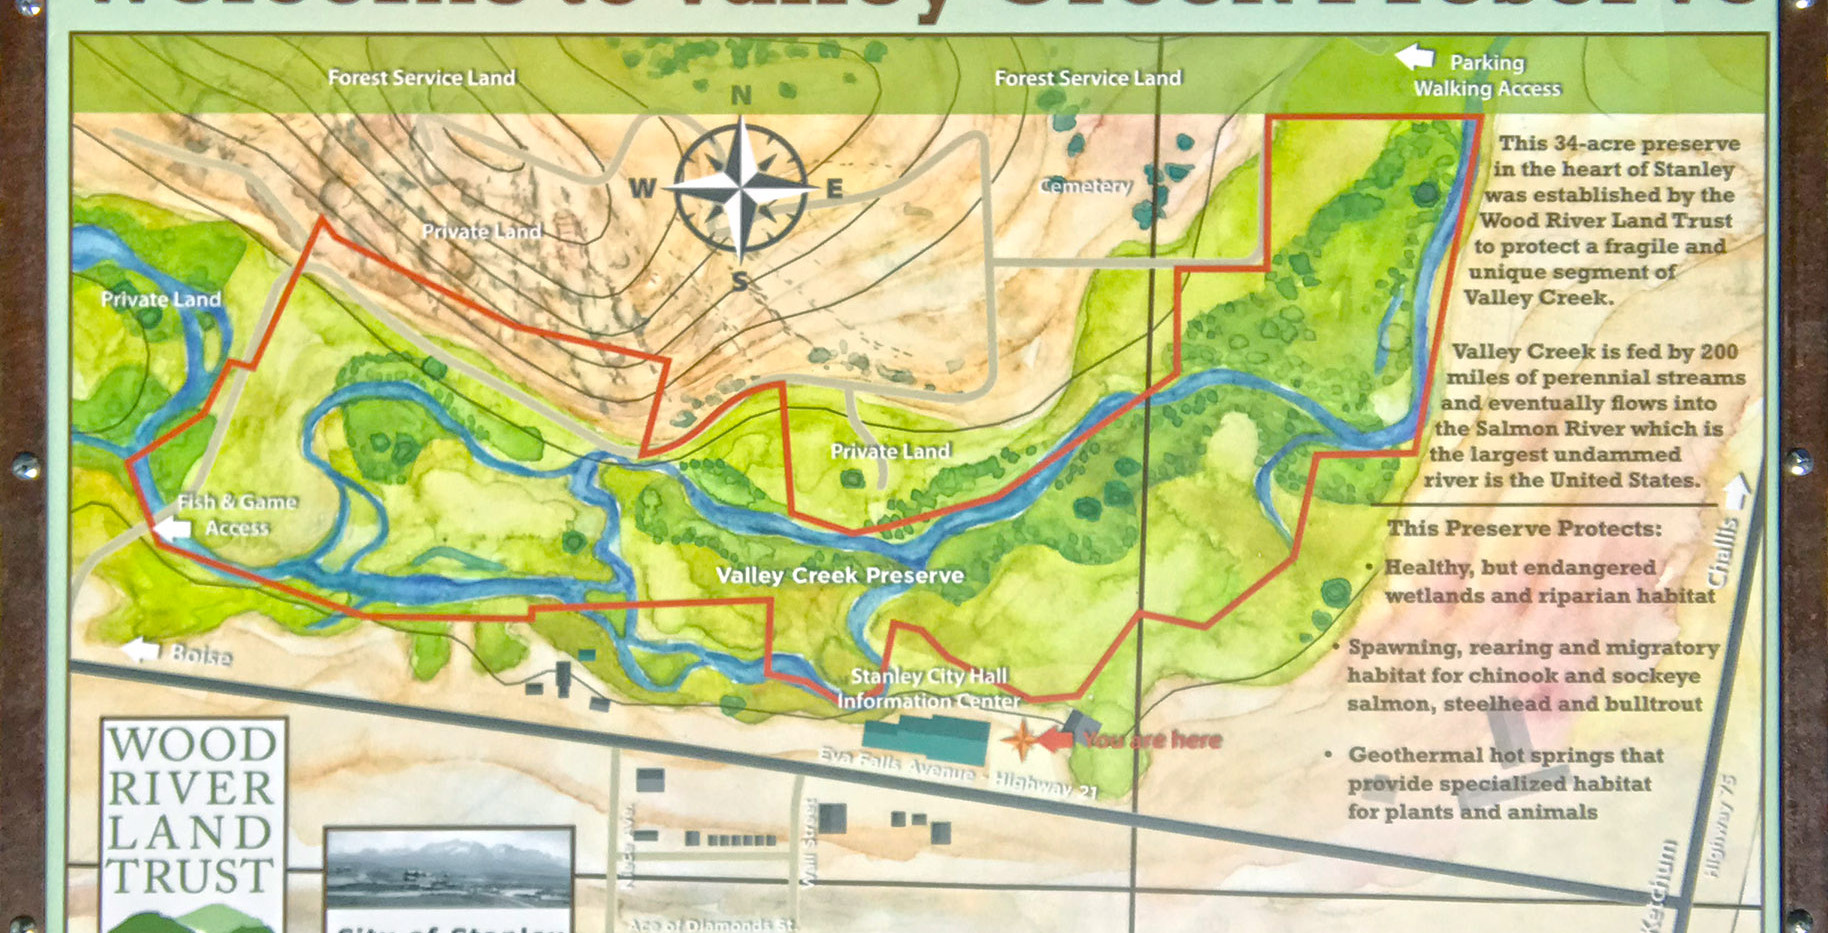 StanleyWStanley Wetlands - Panel 2  2018etlandsPanel_RealLife_map.jpg